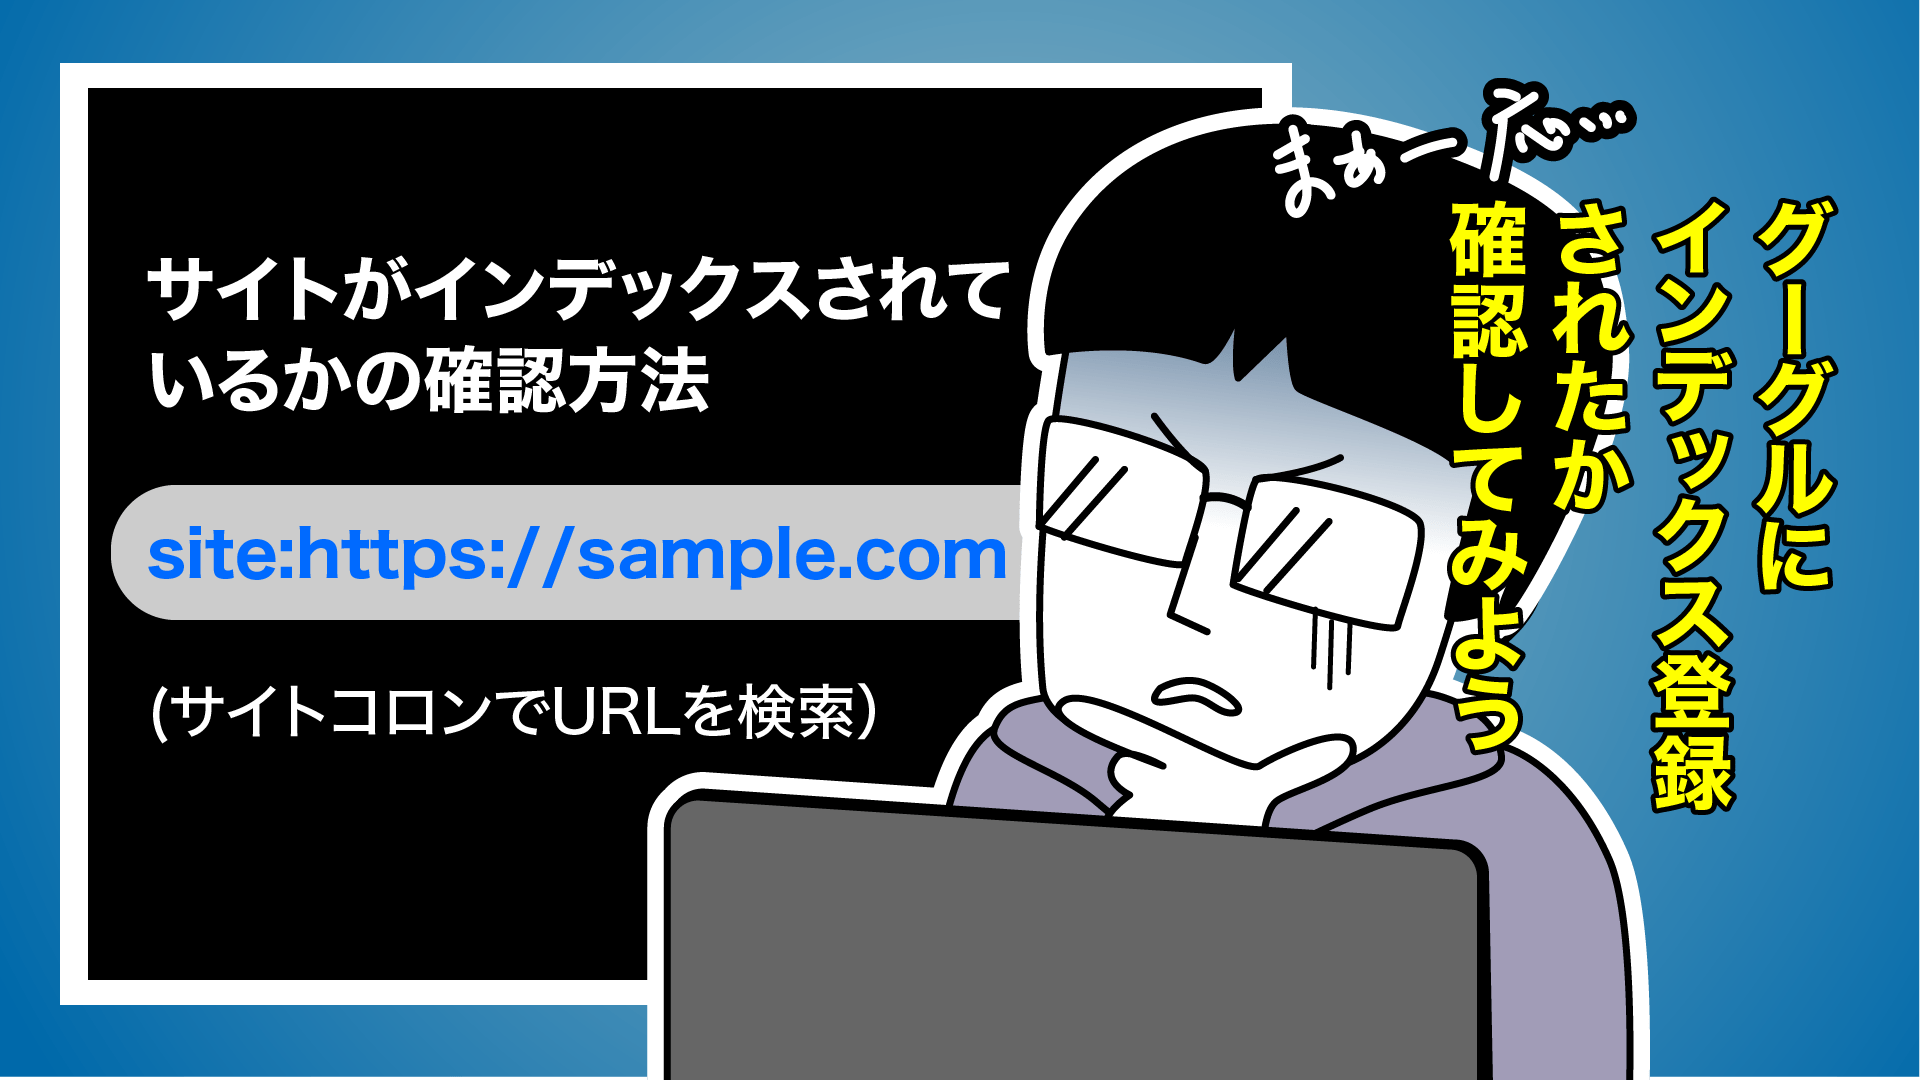 SEO対策漫画ーNOINDEXに気を付けろ②